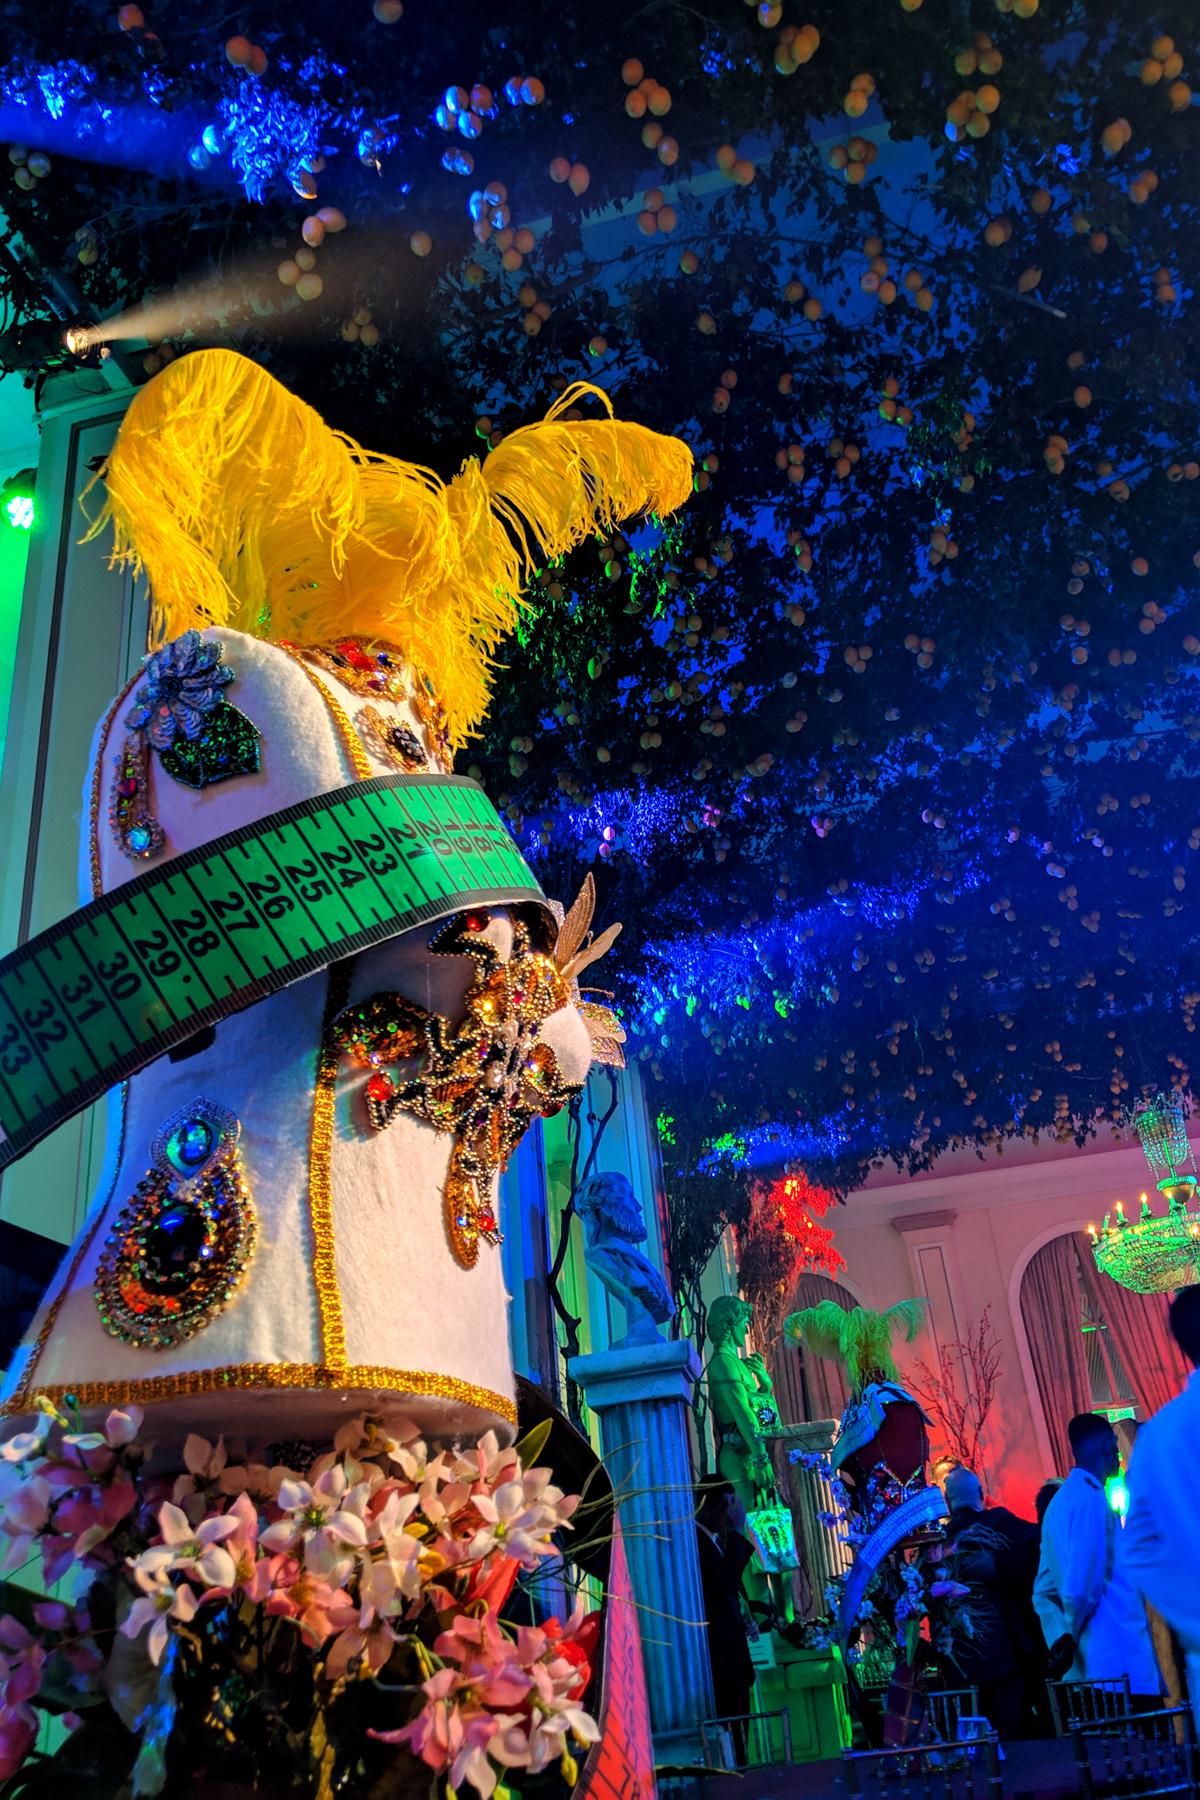 Stacie Flinner x Belmond Copacabana Carnival Ball-14.jpg